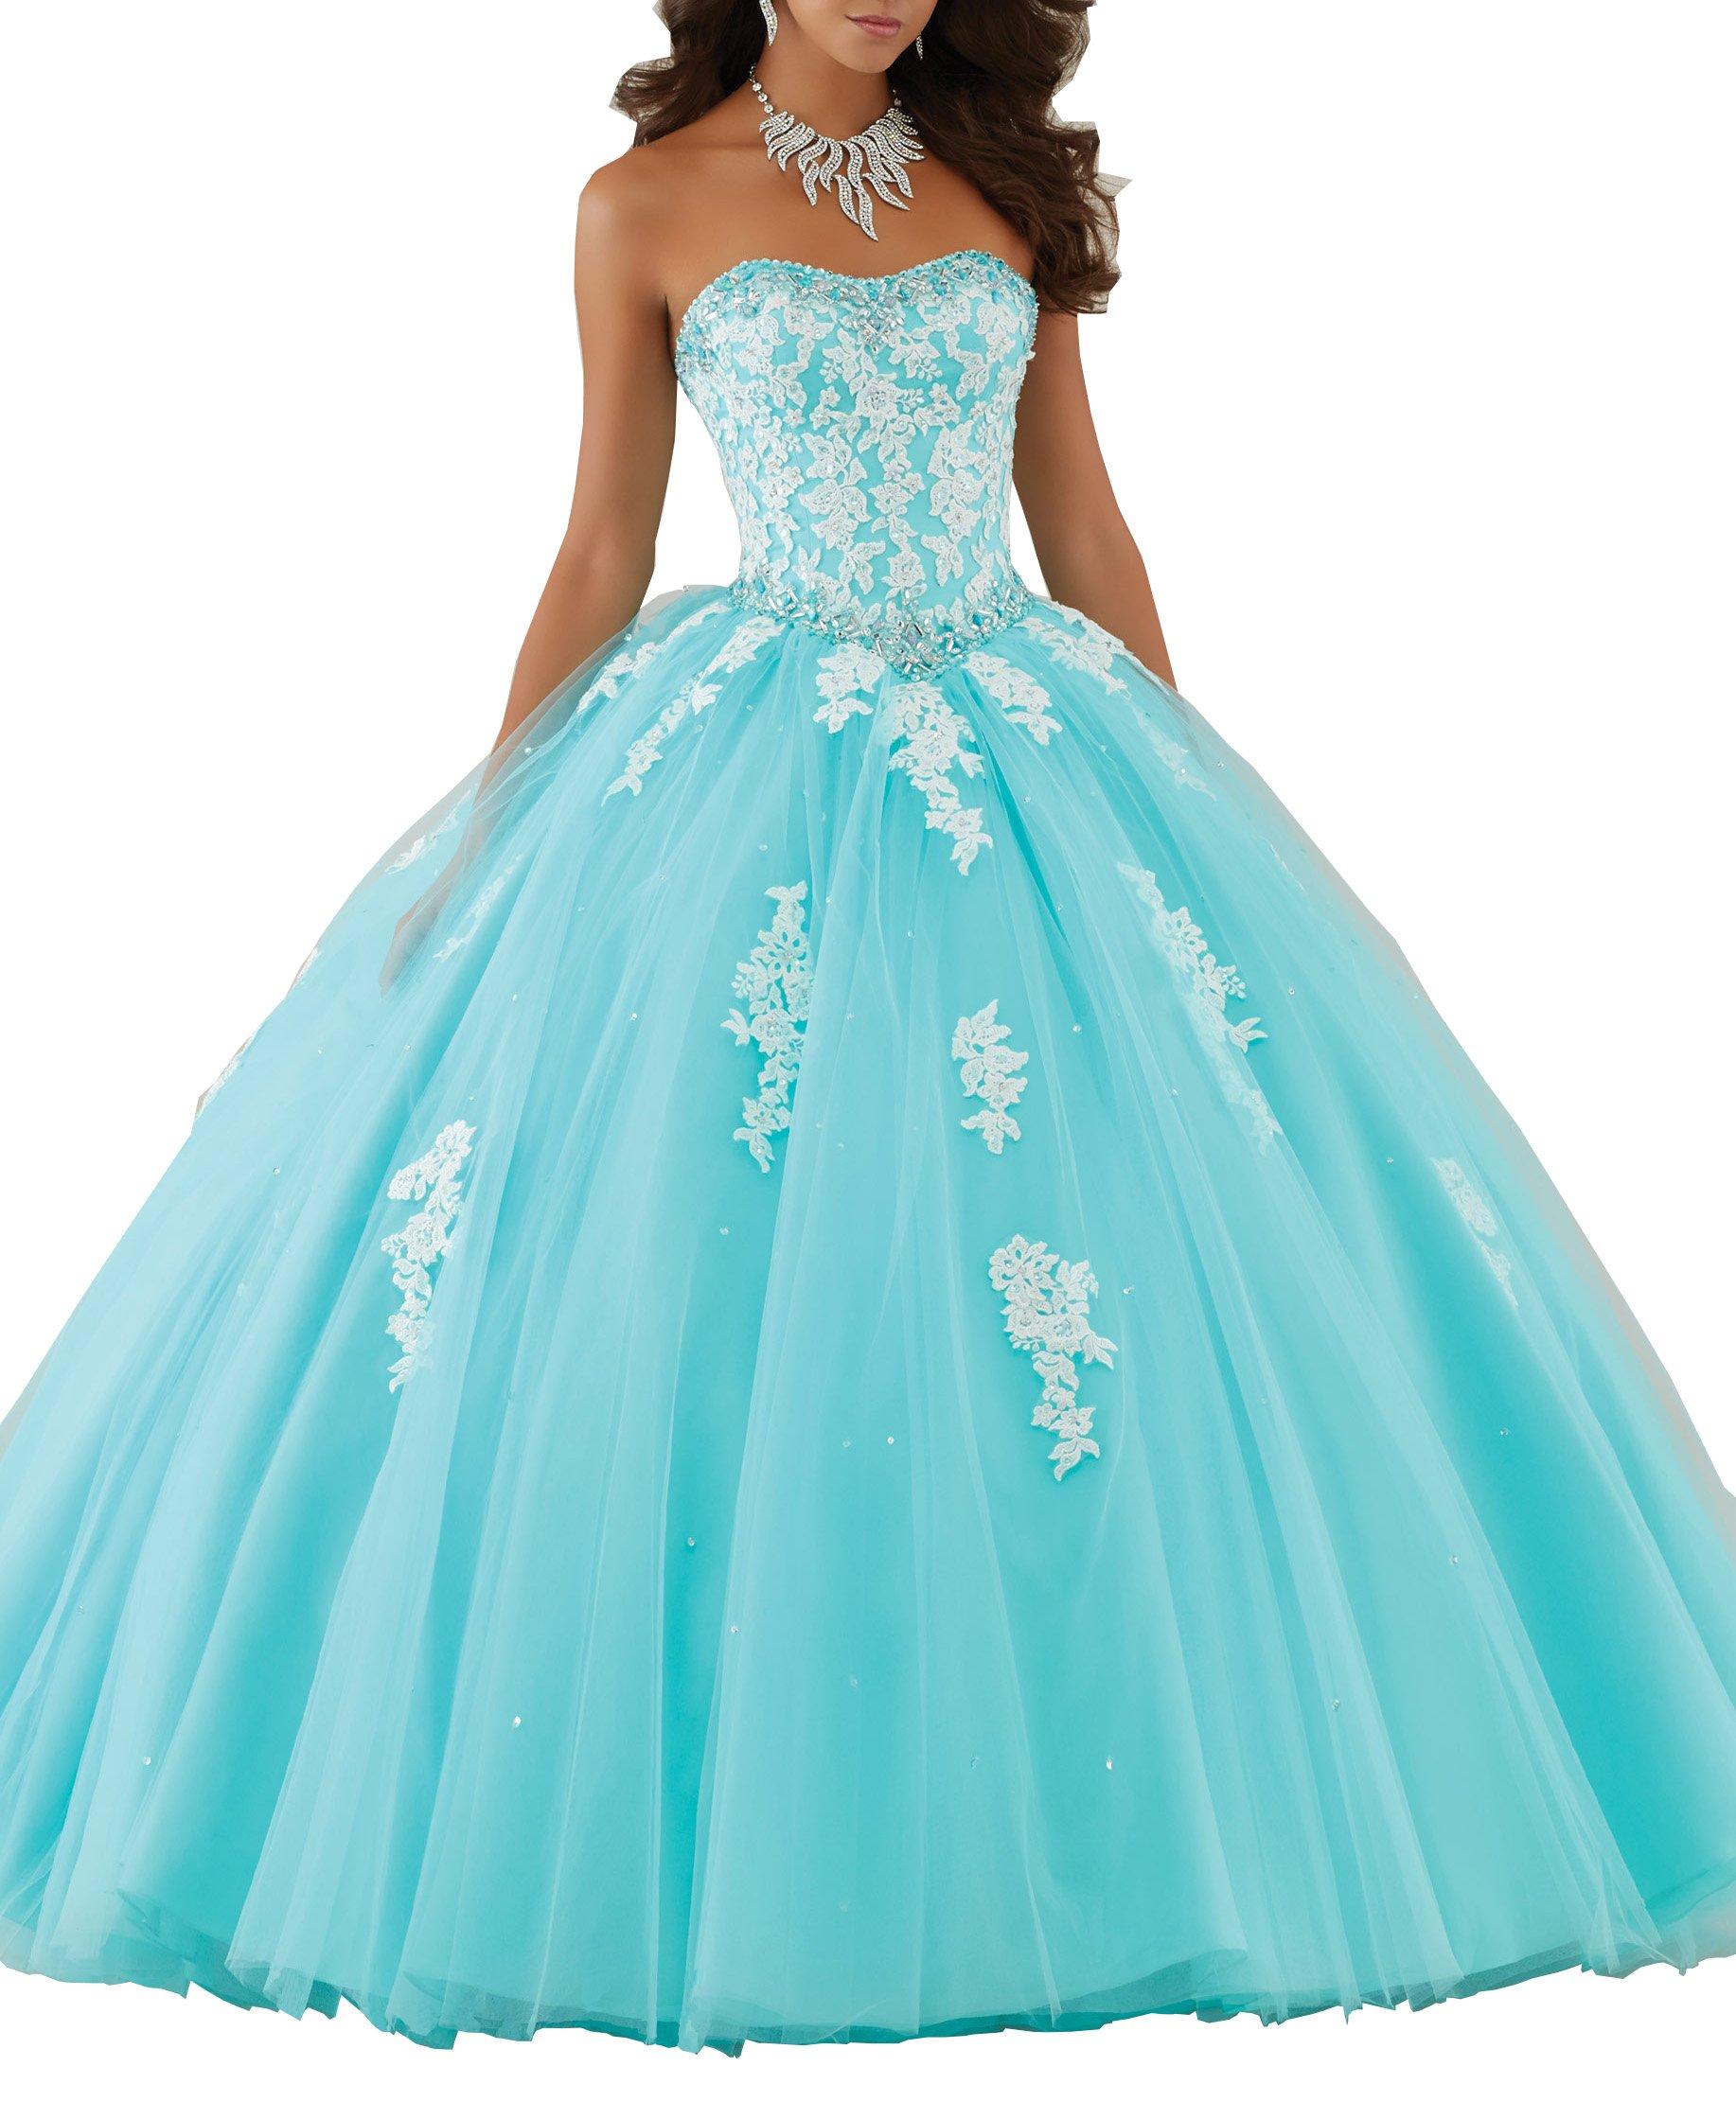 Princess Prom Dresses: Amazon.com